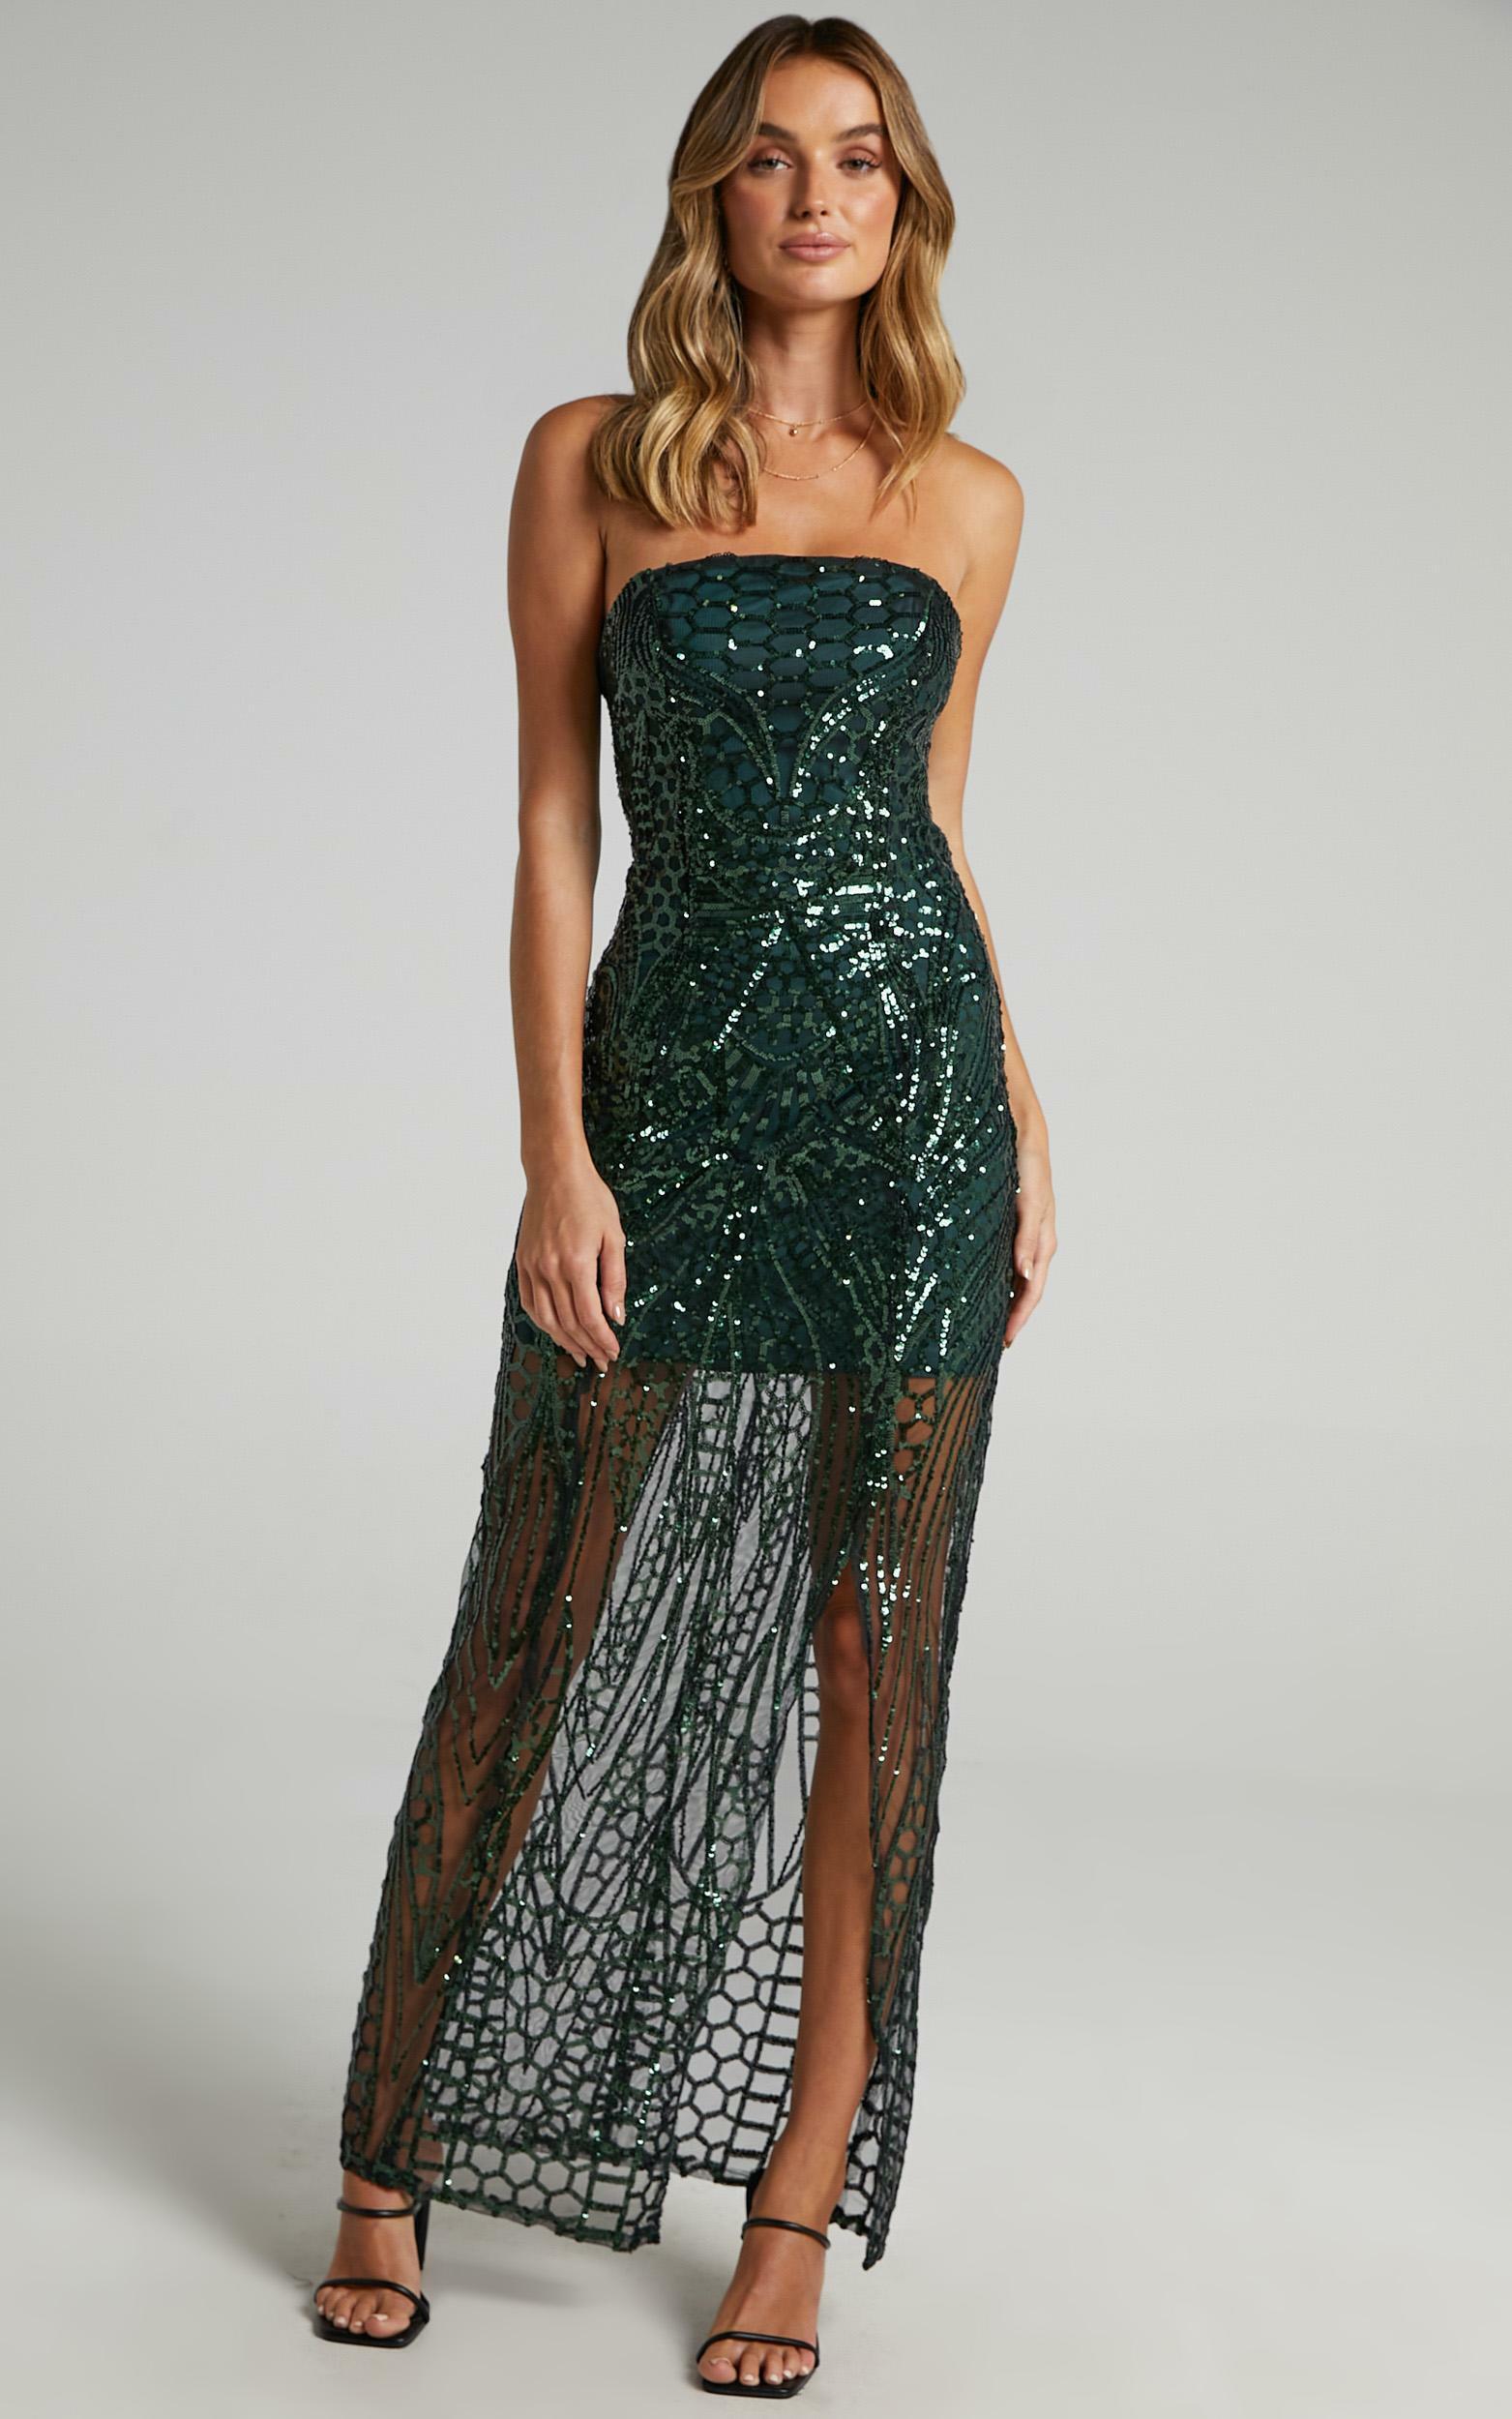 American Hero Maxi Dress In emerald sequin - 20 (XXXXL), Green, hi-res image number null